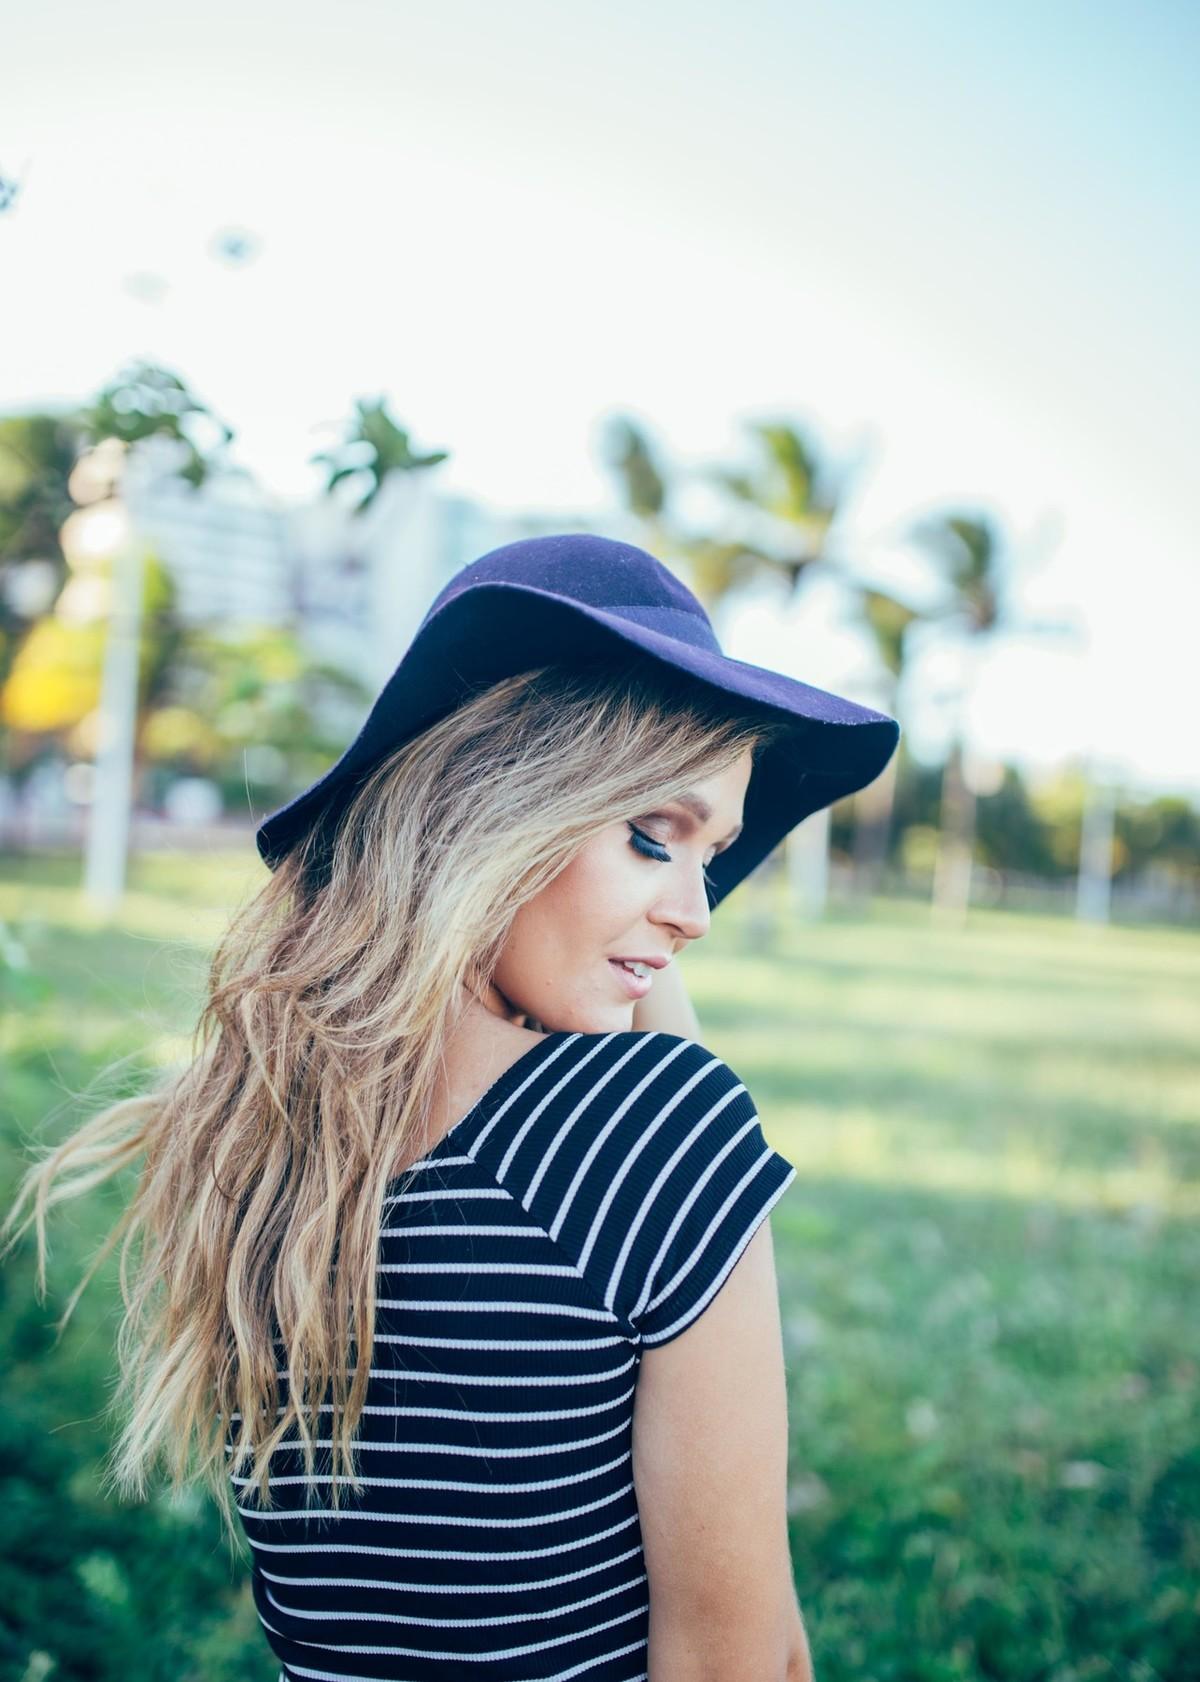 Moda vitoria editoral fashion capixaba fotos ensaio cute feminina look dia beauty girls make-up hair ensaio feminine book ilha frade canoa havaiana moda